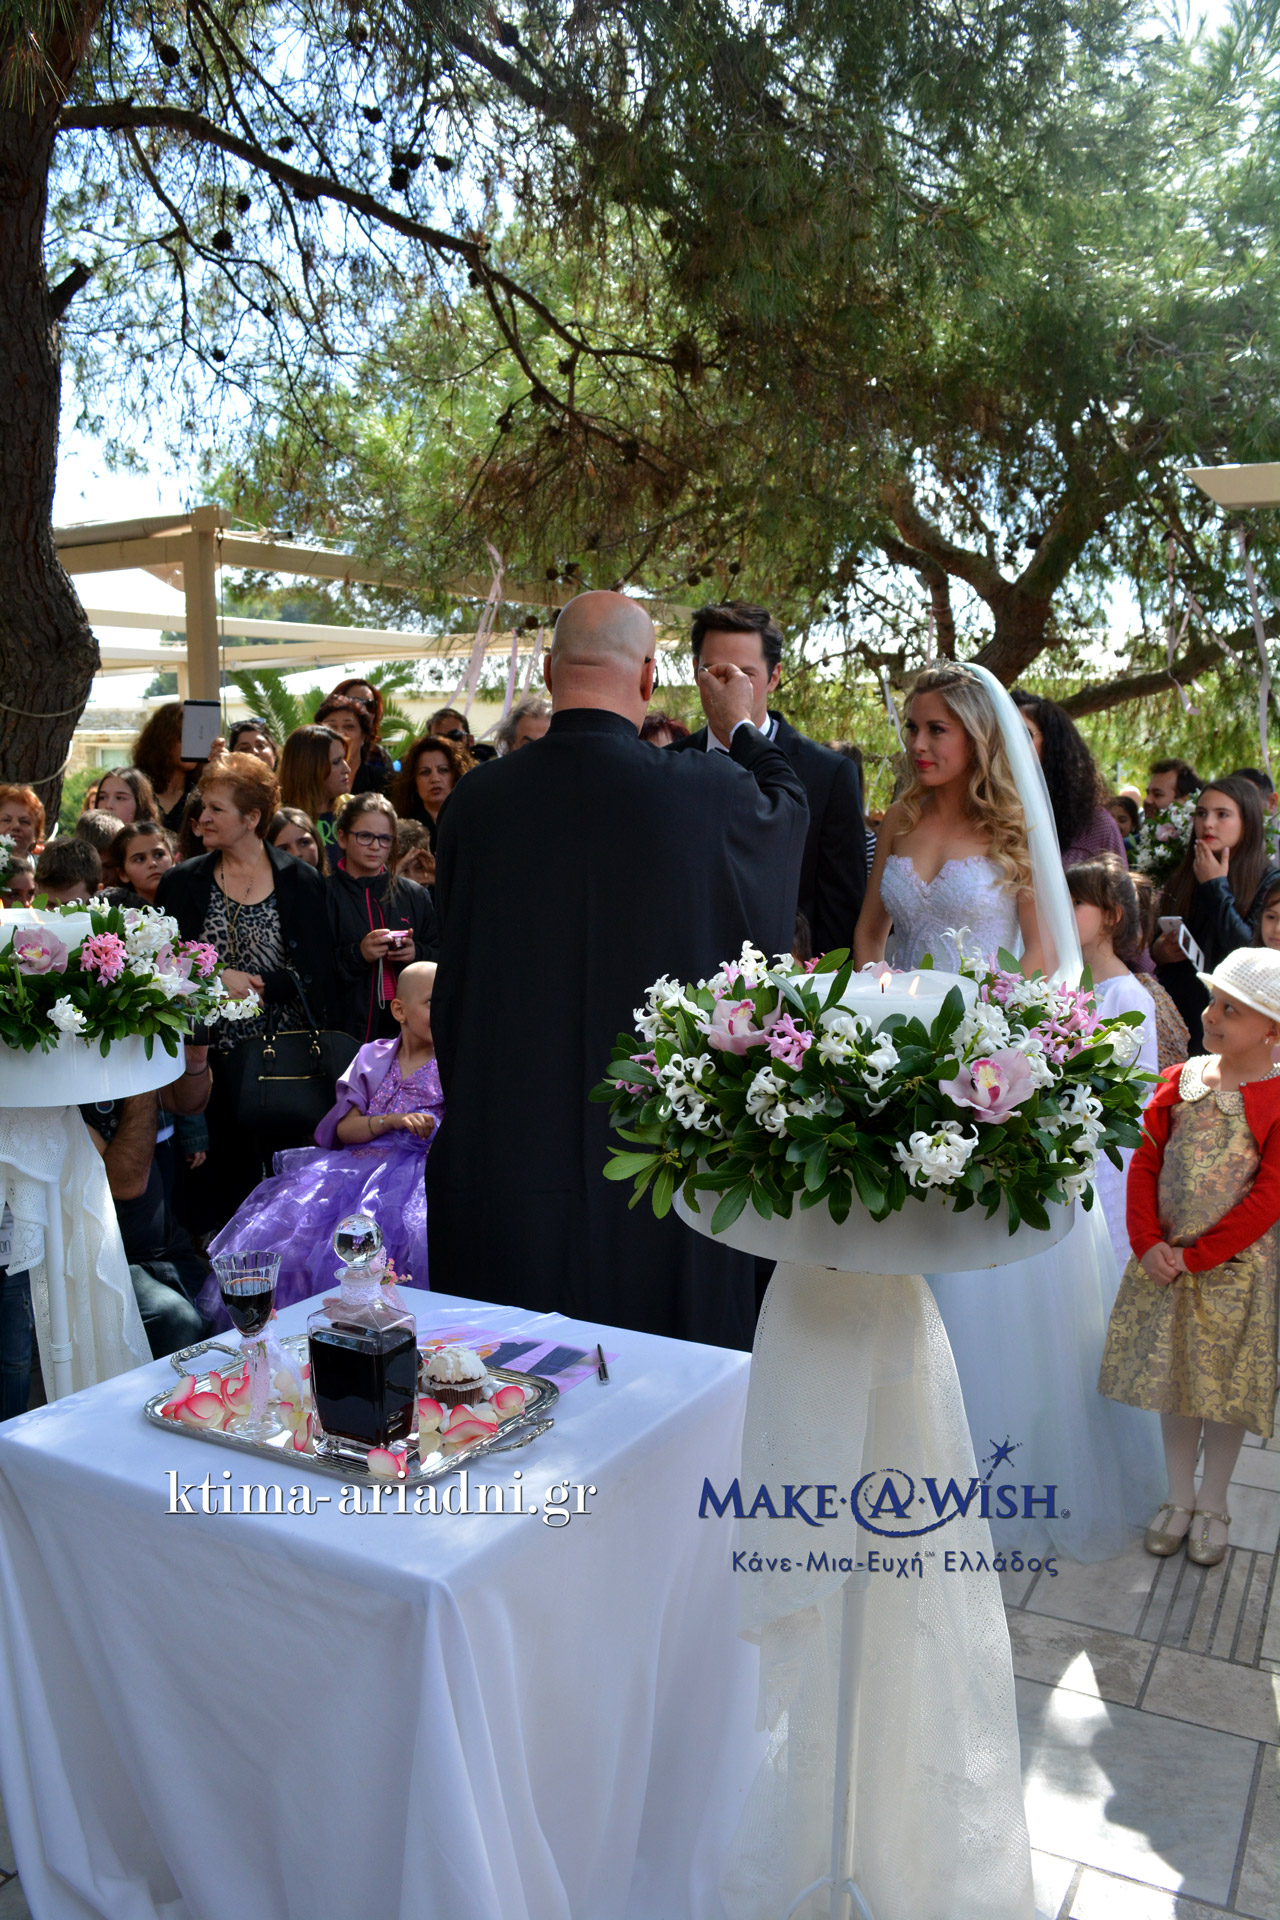 Make a Wish… κι έγινε! Μια υπέροχη μέρα για τη Σπυριδούλα στον γάμο της Barbie και του Ken